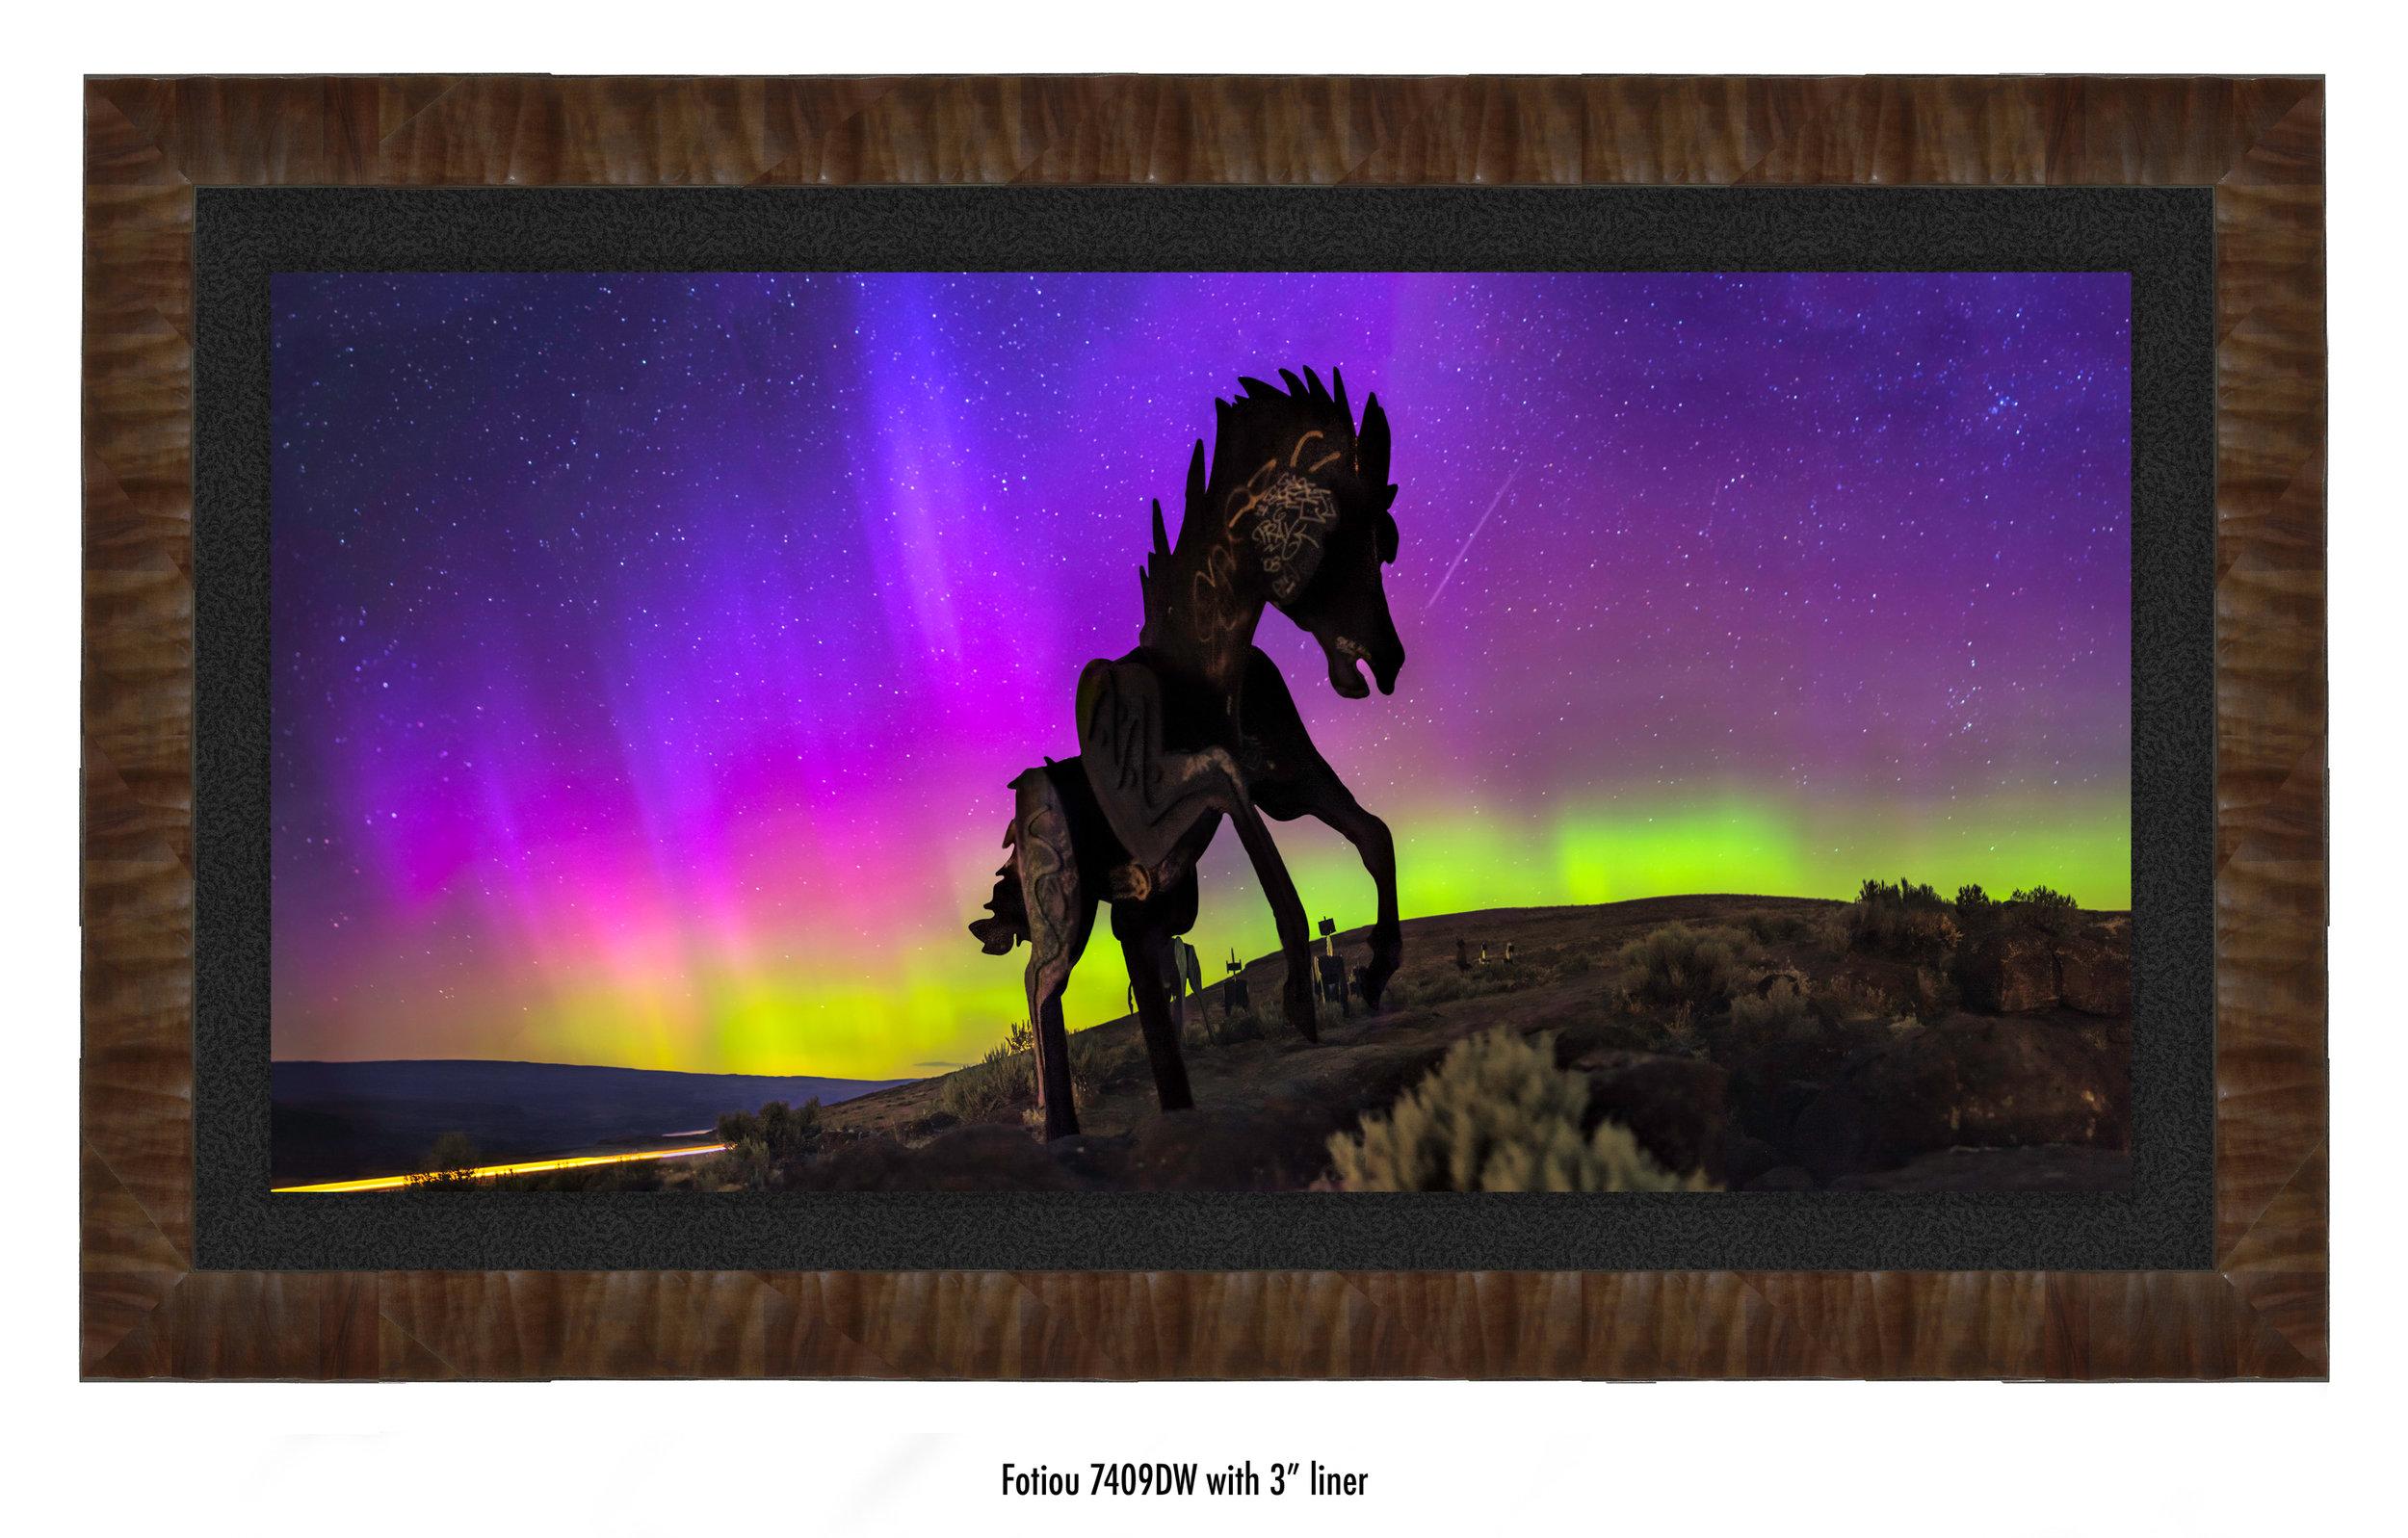 Wild-Horses-7409DW-blk.jpg